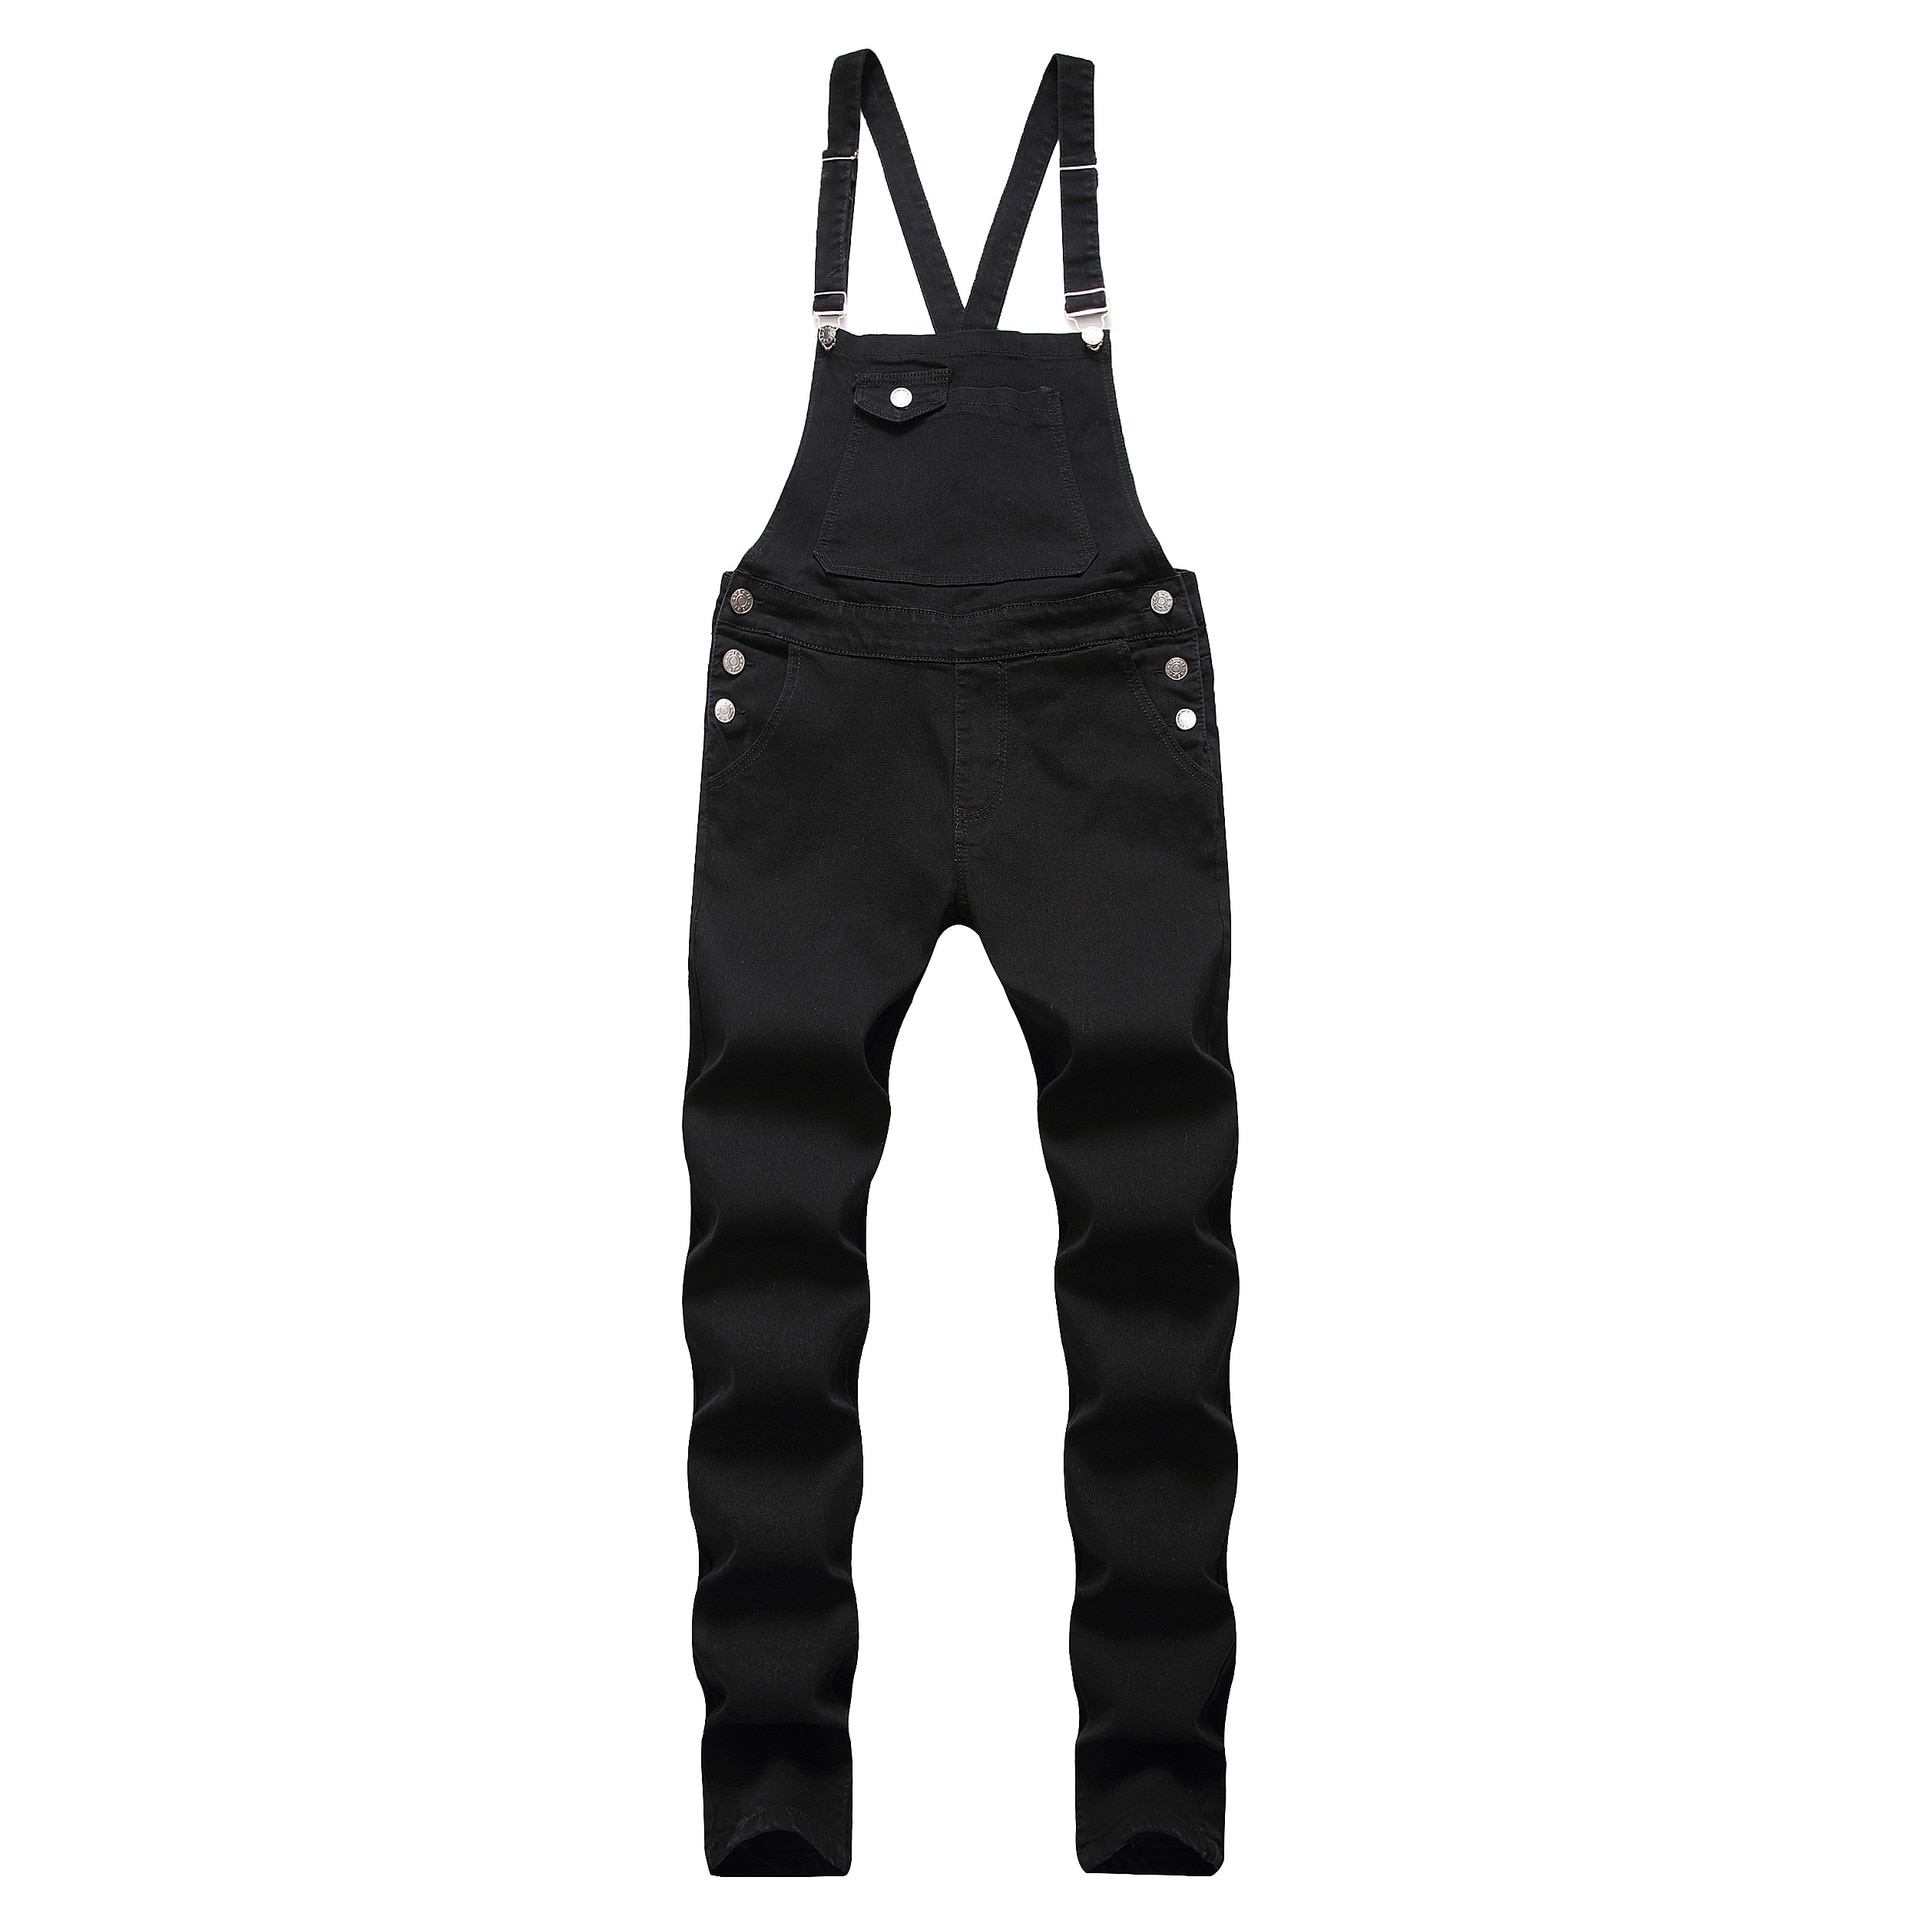 Pontalon Homme Jean 2019 Denim Overalls Men Worn Out Jeans Men Stretch Men's Sling Denim Romper Bib Spodnie Meskie Jeans Mens